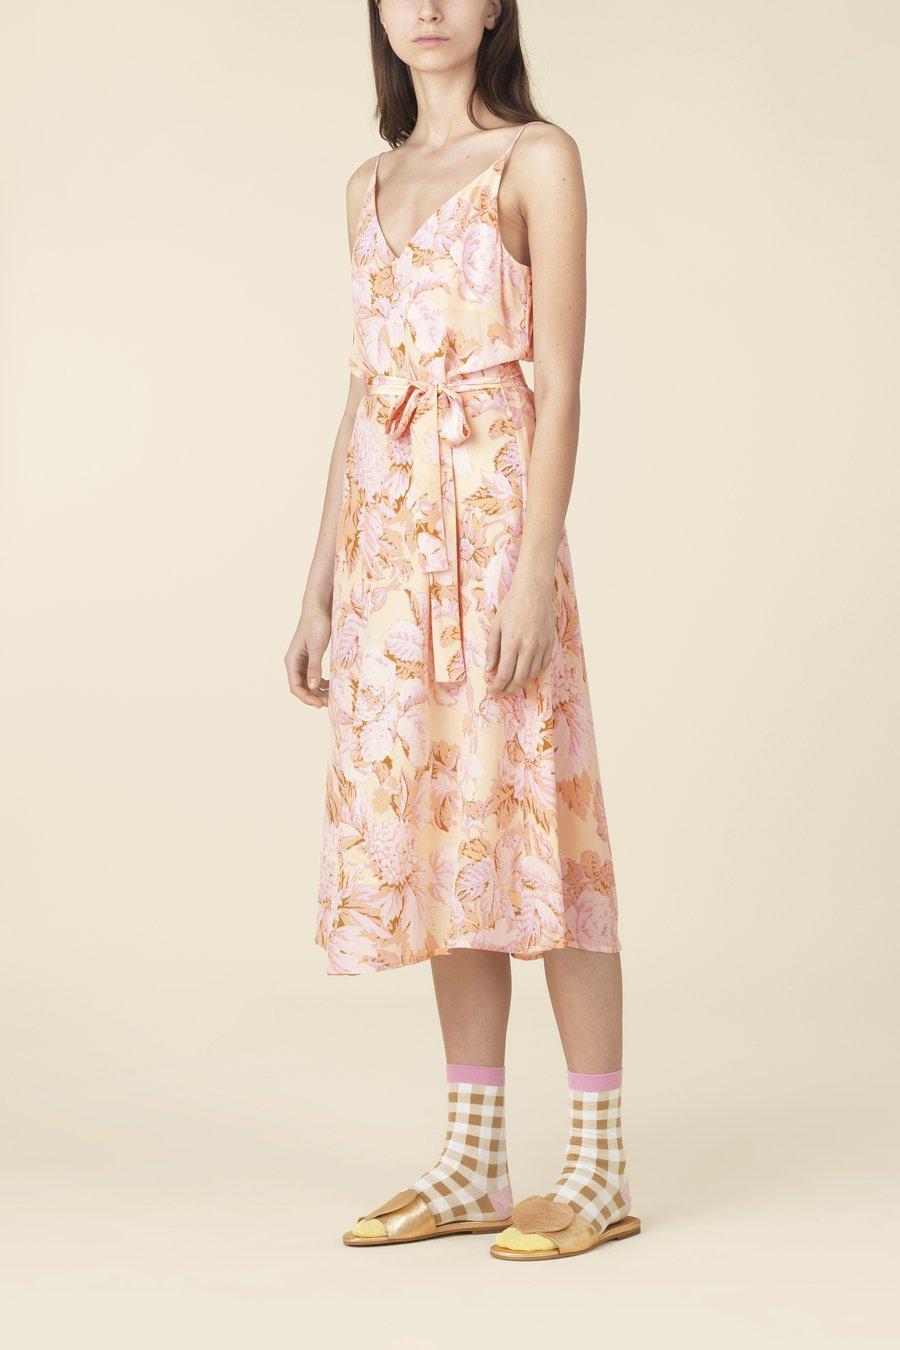 Gianna_Dress-Dress-SG2344-1022_Hortensia_Light_900x.jpg